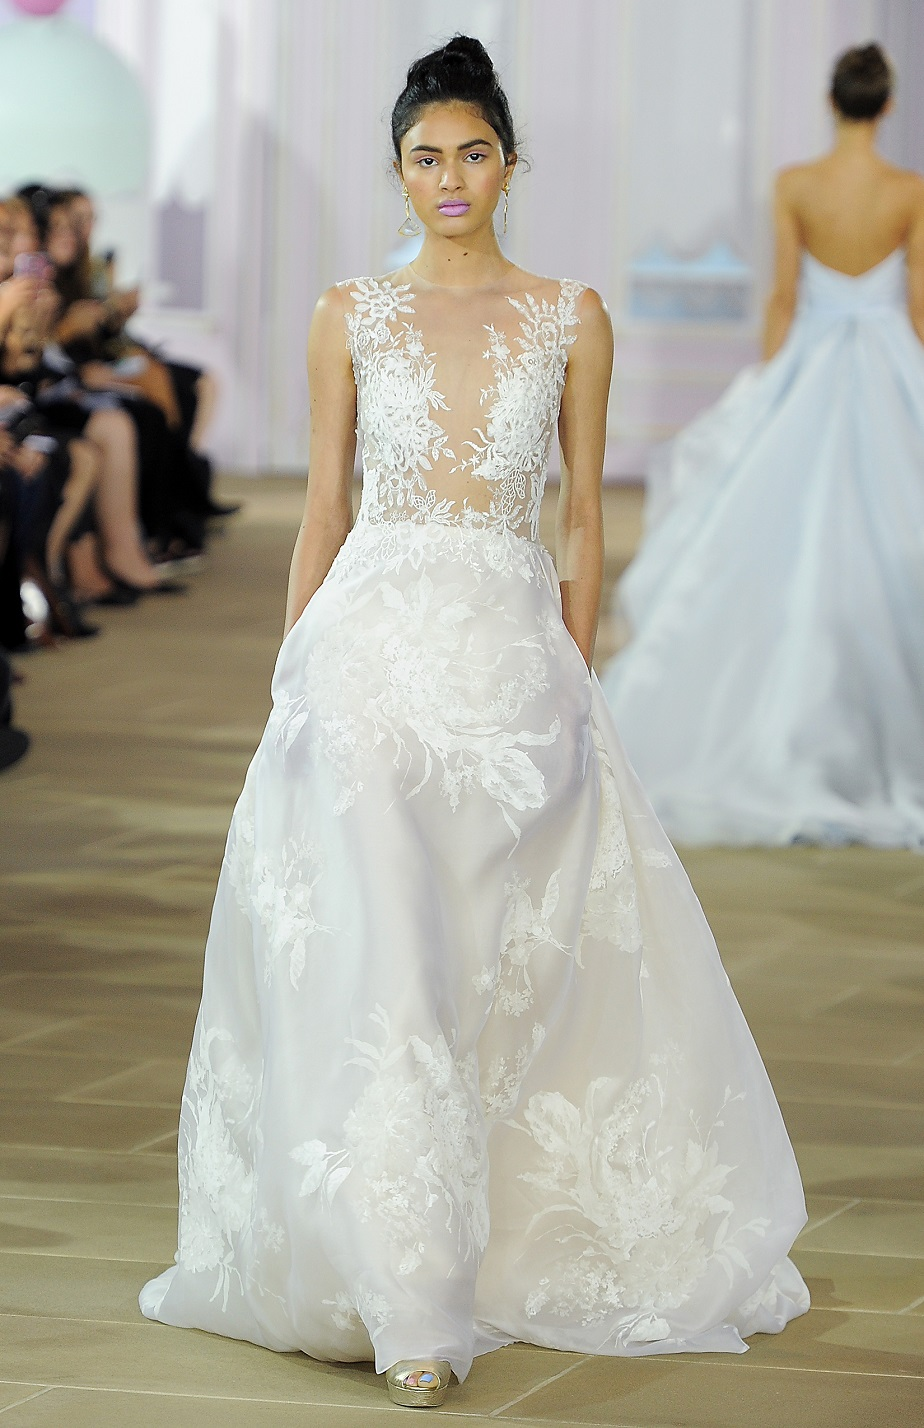 New Wedding Gowns At Anna Banna B Bridal Boutique Denver Co